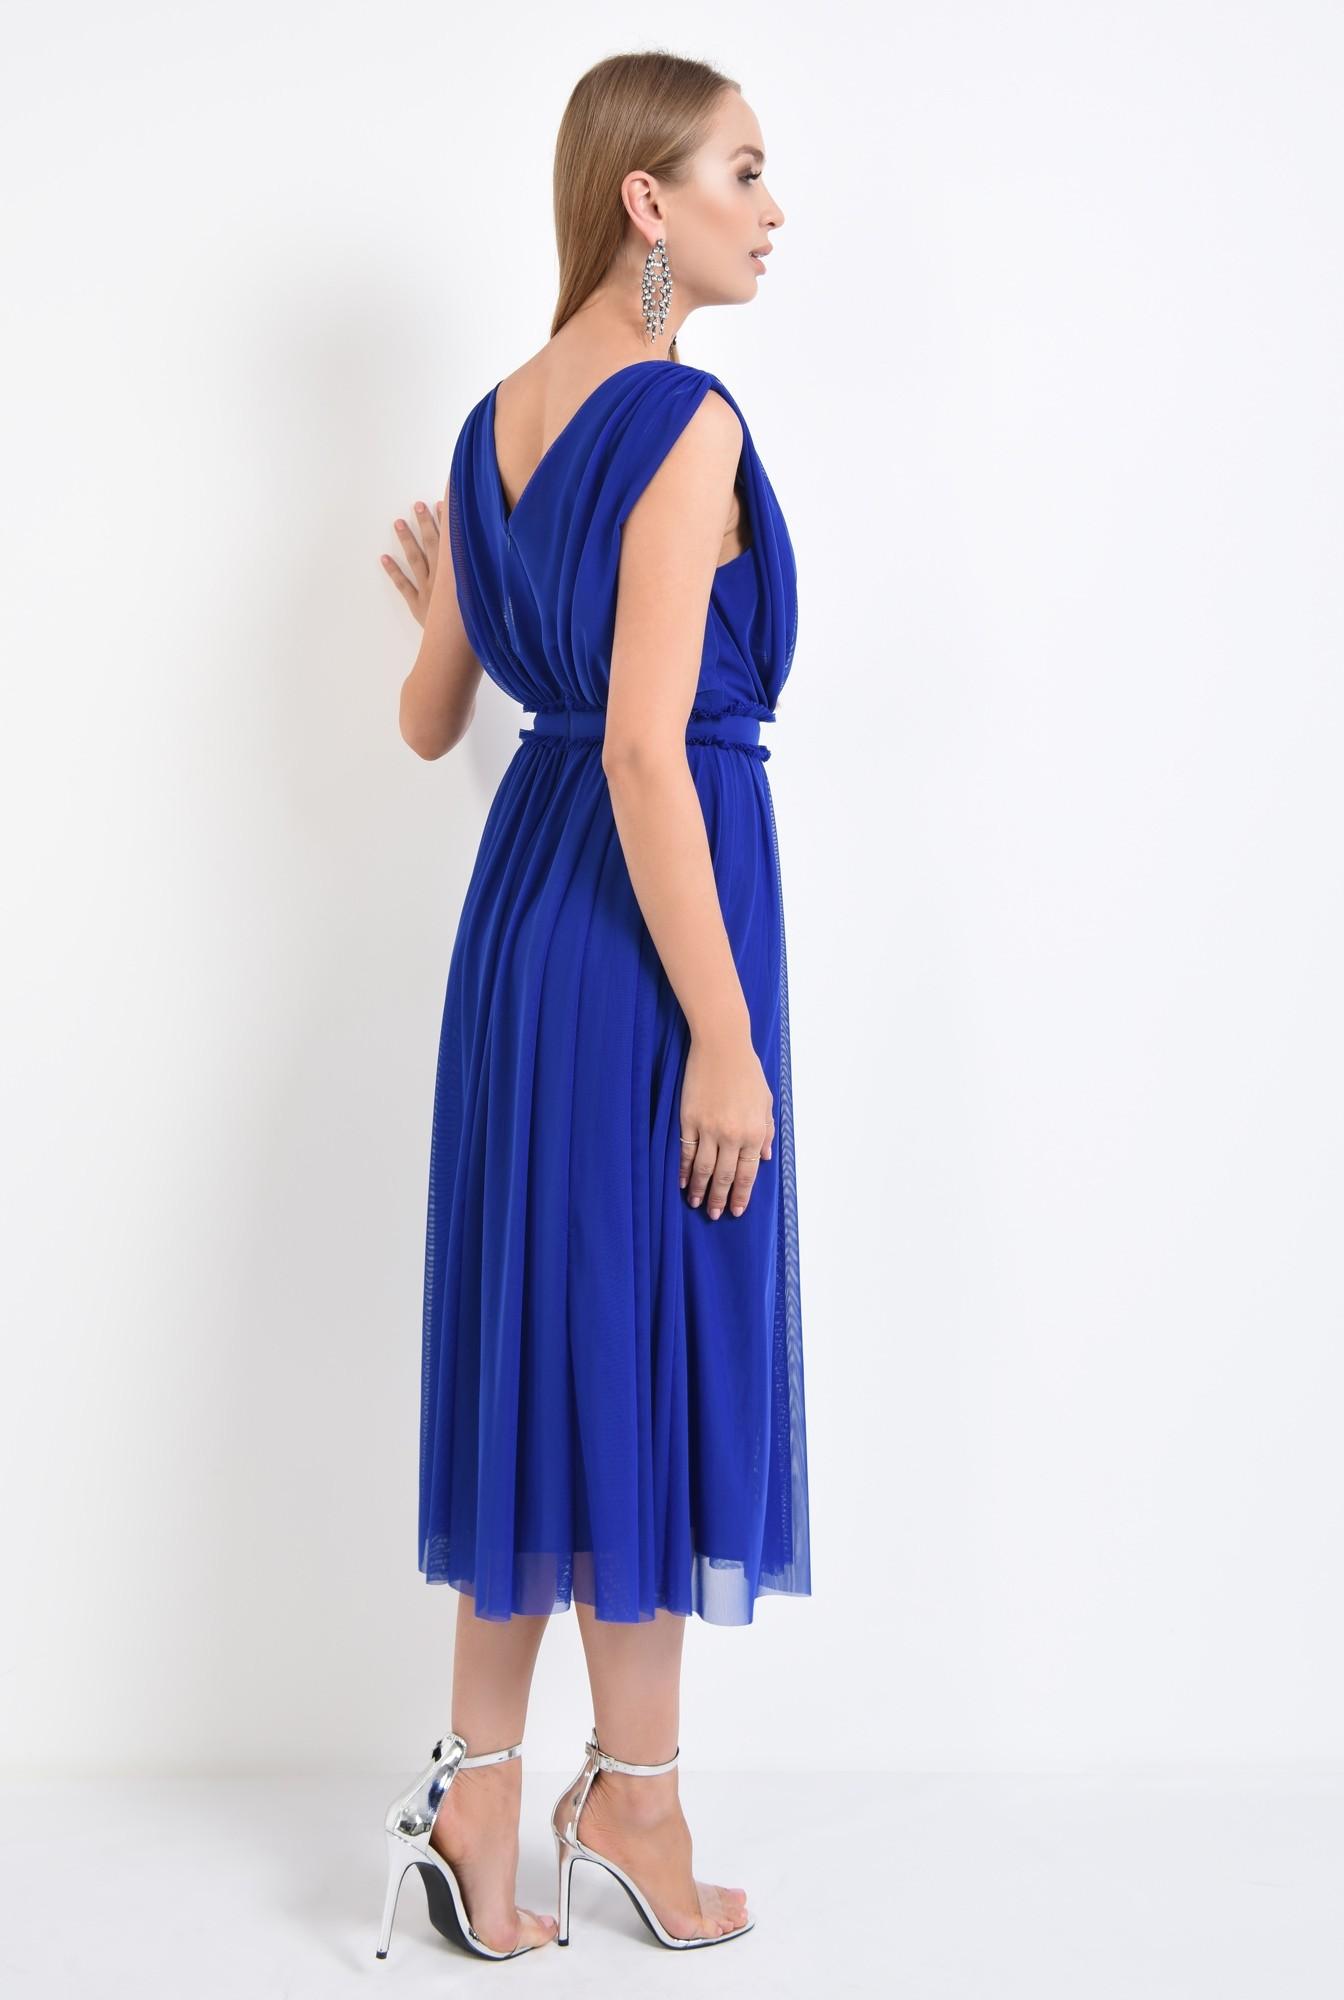 1 - 360 - rochie de seara, tul, albastru, clos, midi, rochii online